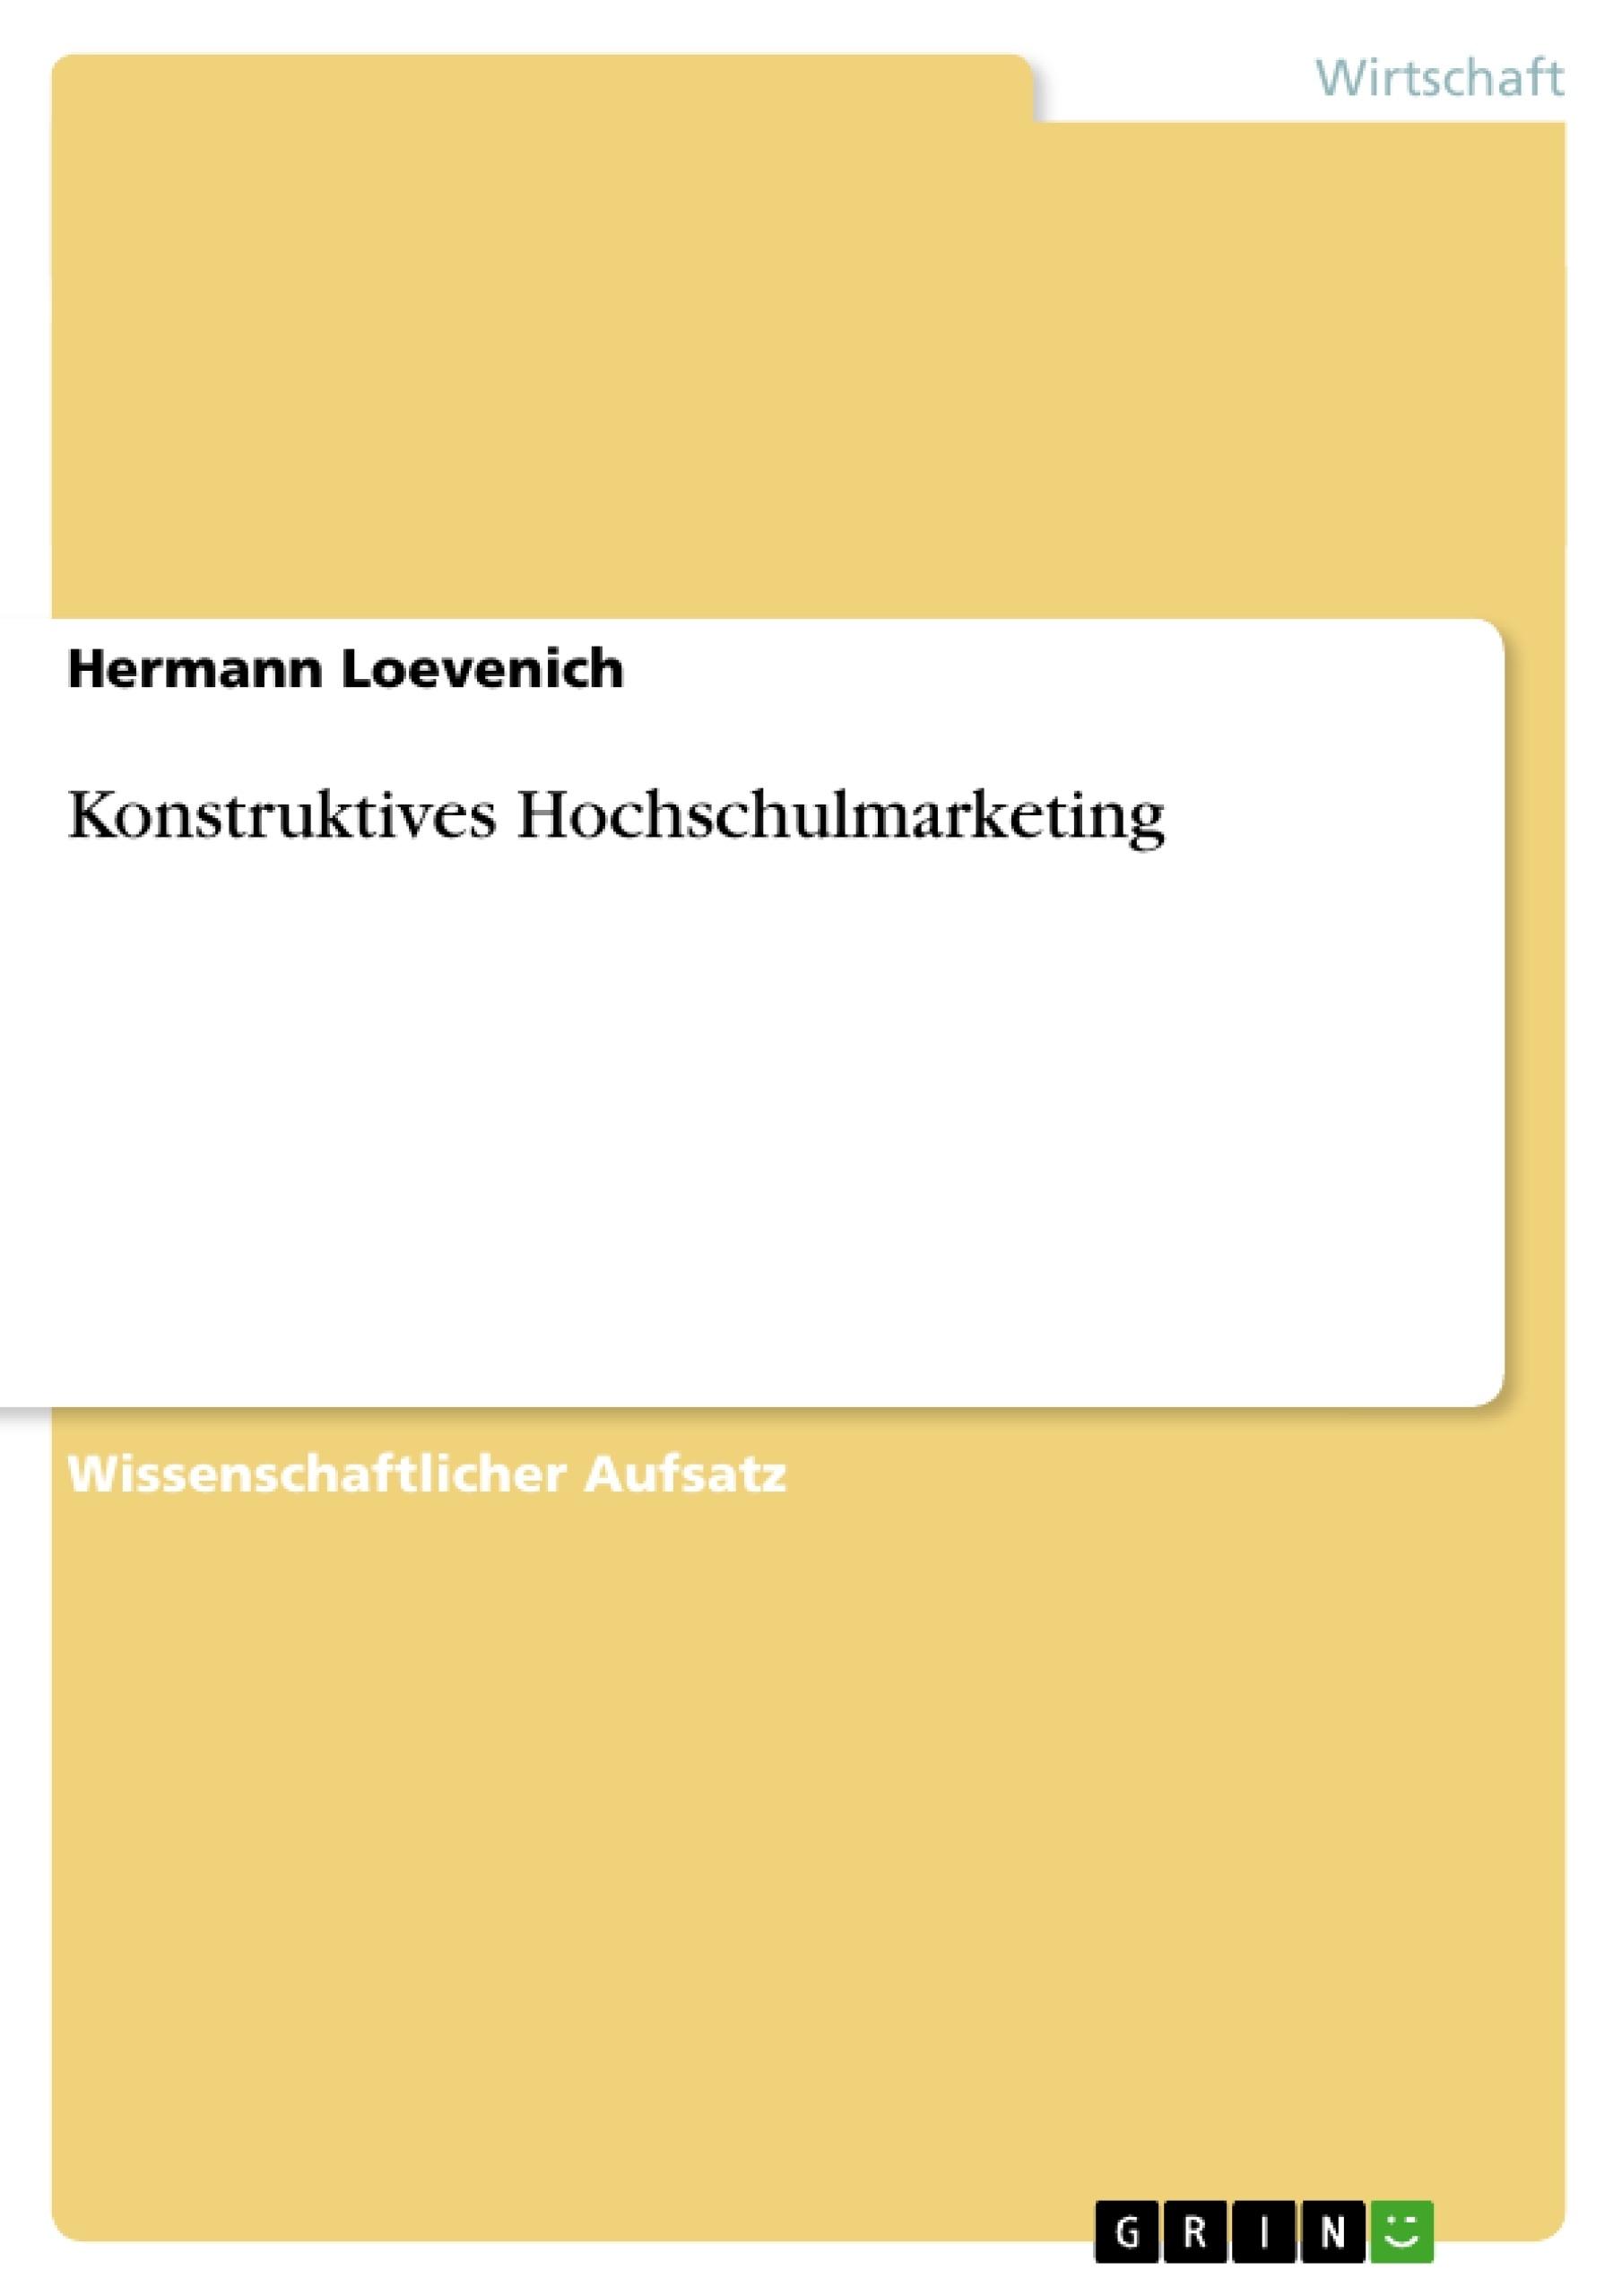 Titel: Konstruktives Hochschulmarketing